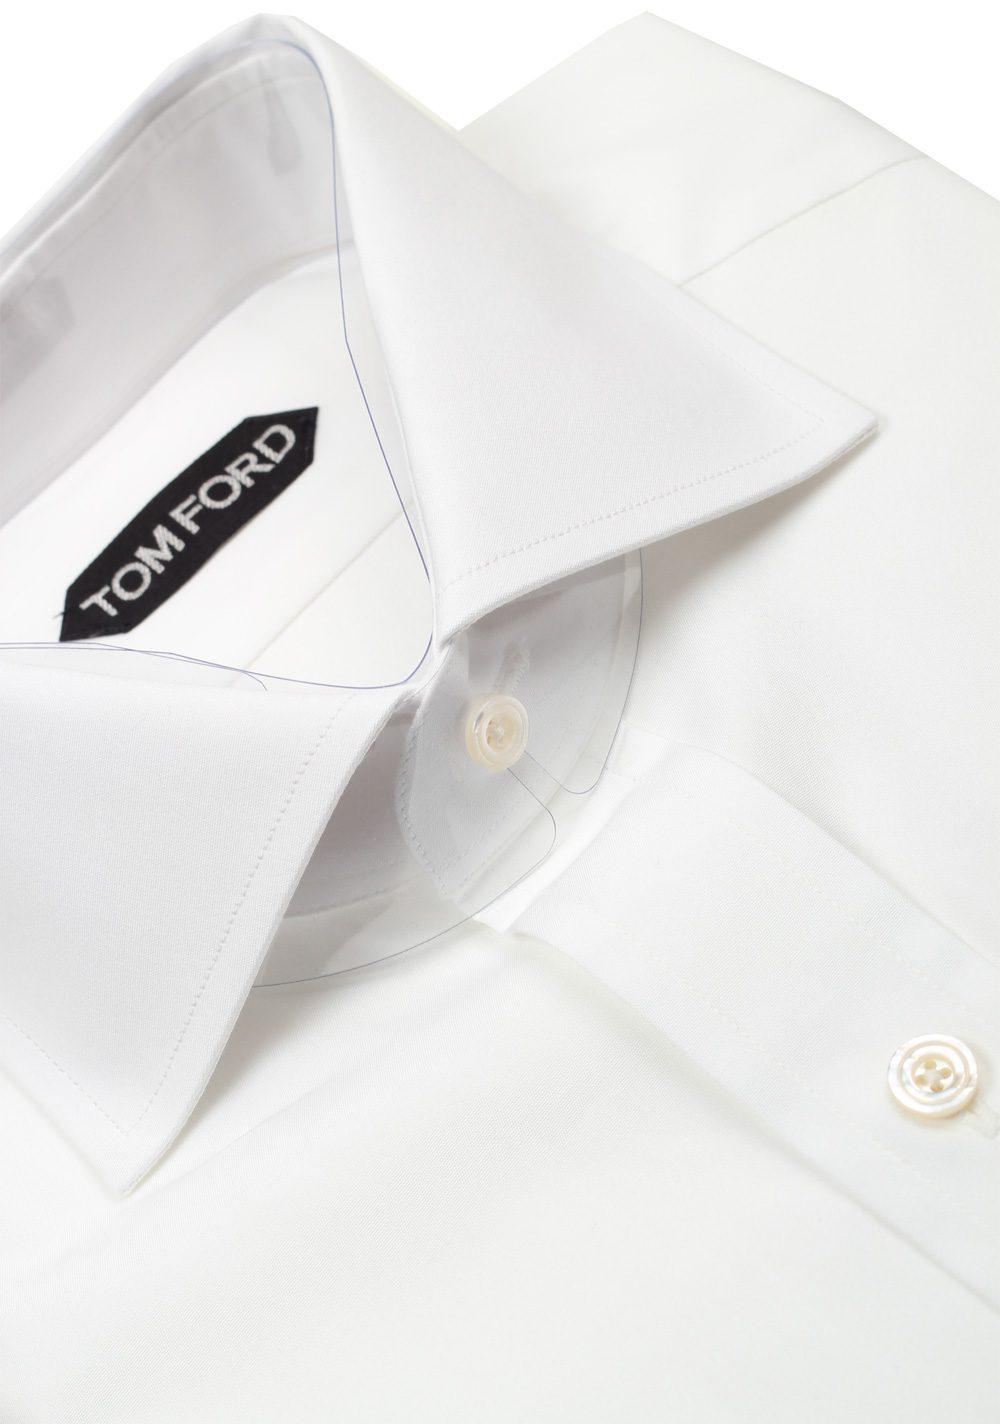 TOM FORD Solid White Dress Spread Shirt Barrel Cuffs Size 38 / 15 U.S. Slim Fit   Costume Limité